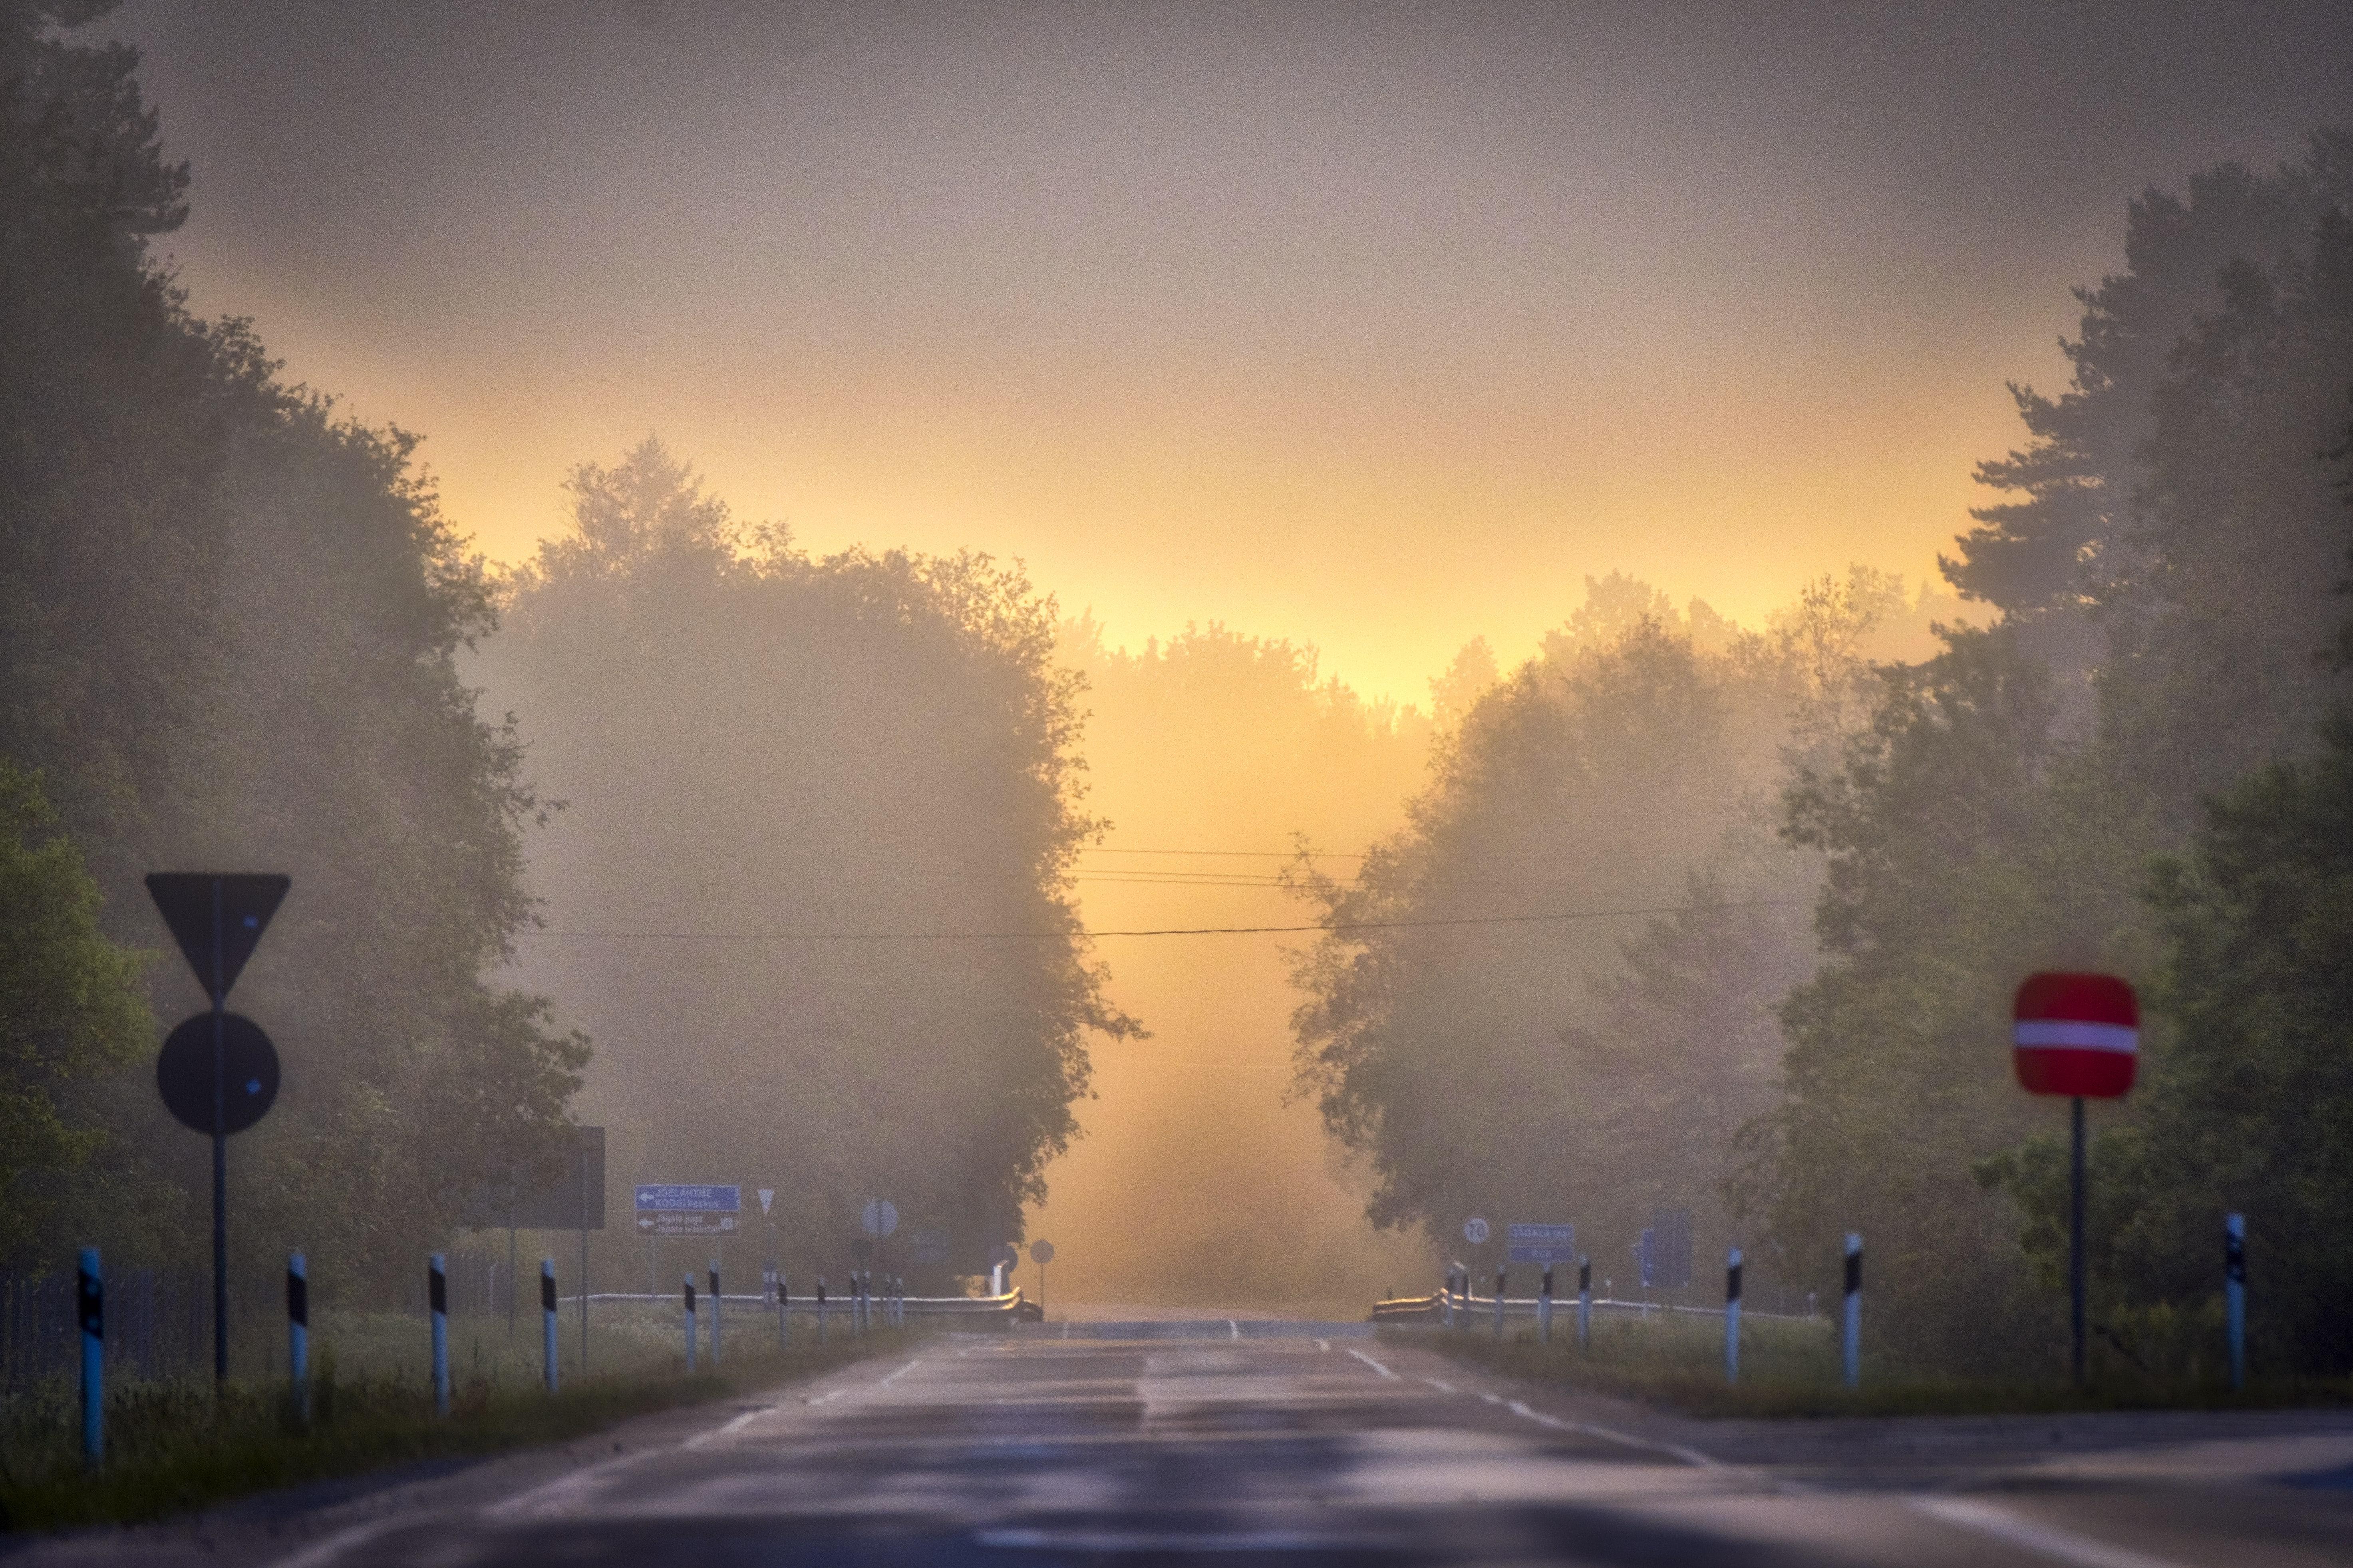 Kaberneeme, Estonia